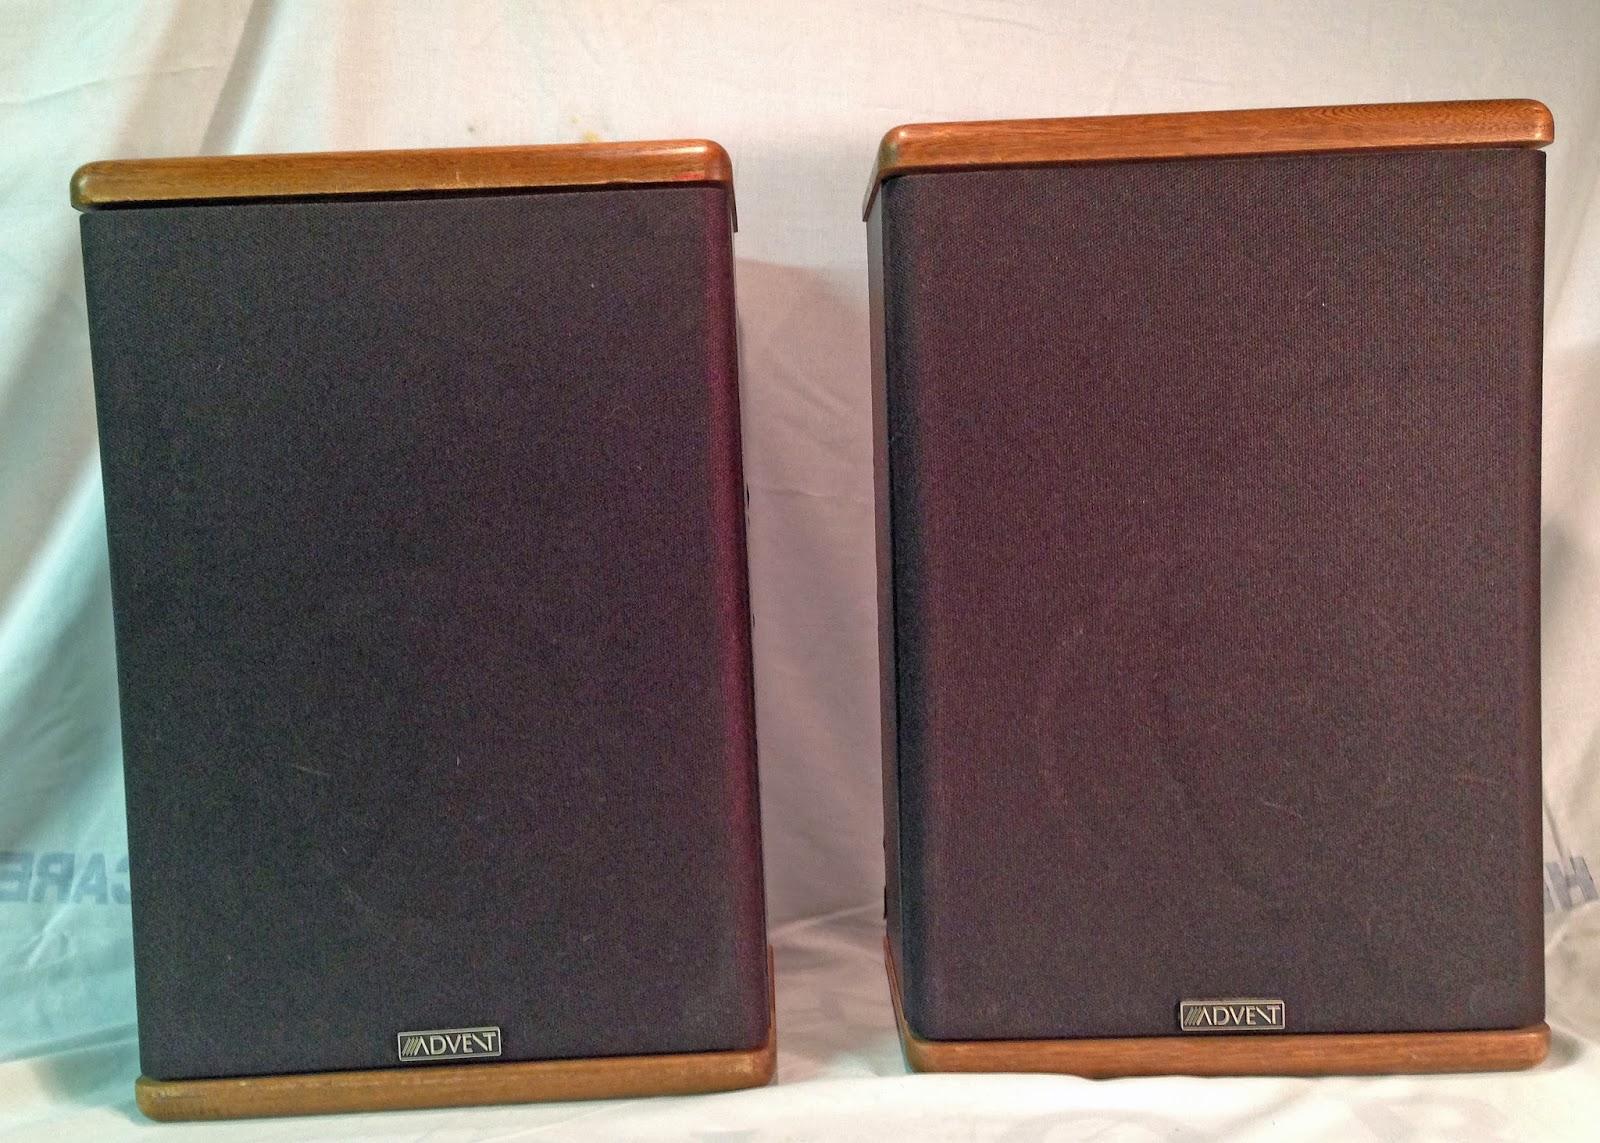 Advent surround sound speakers